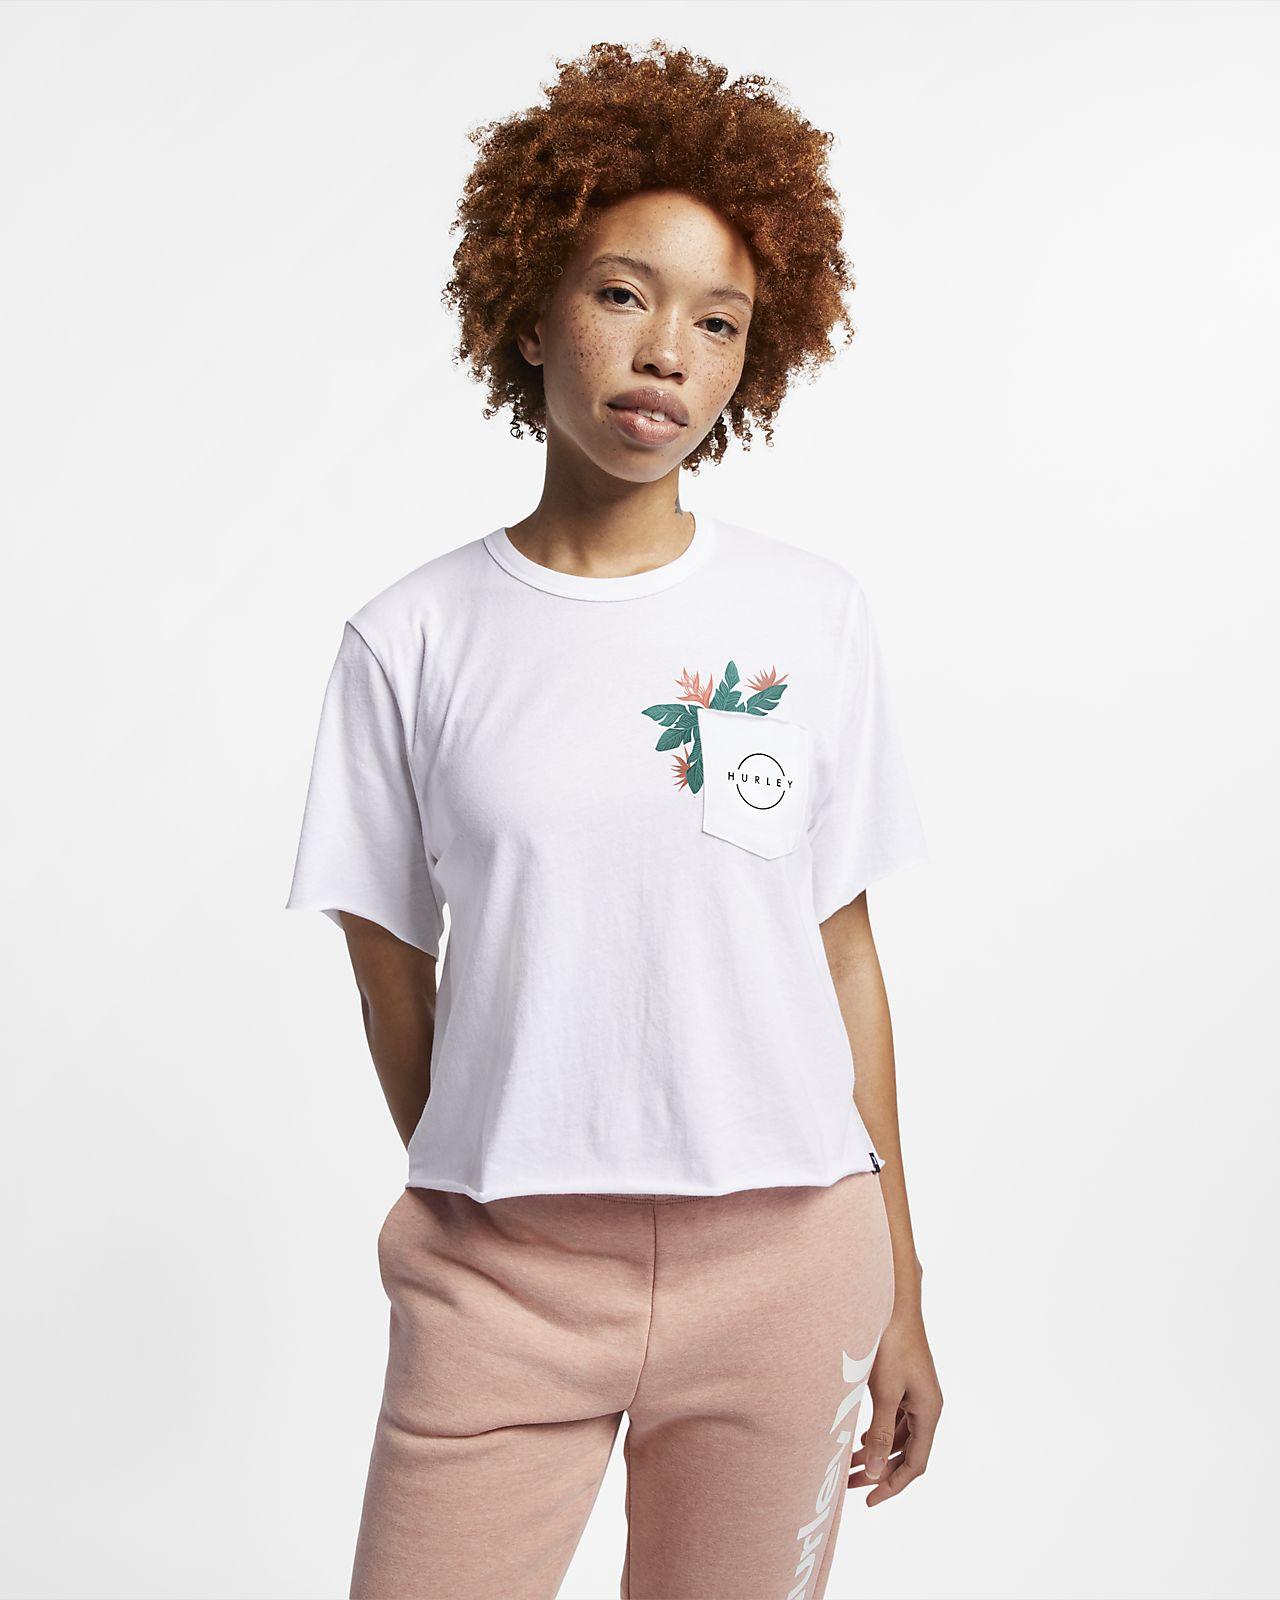 Hurley Hanoi Pocket Kurz-T-Shirt für Damen